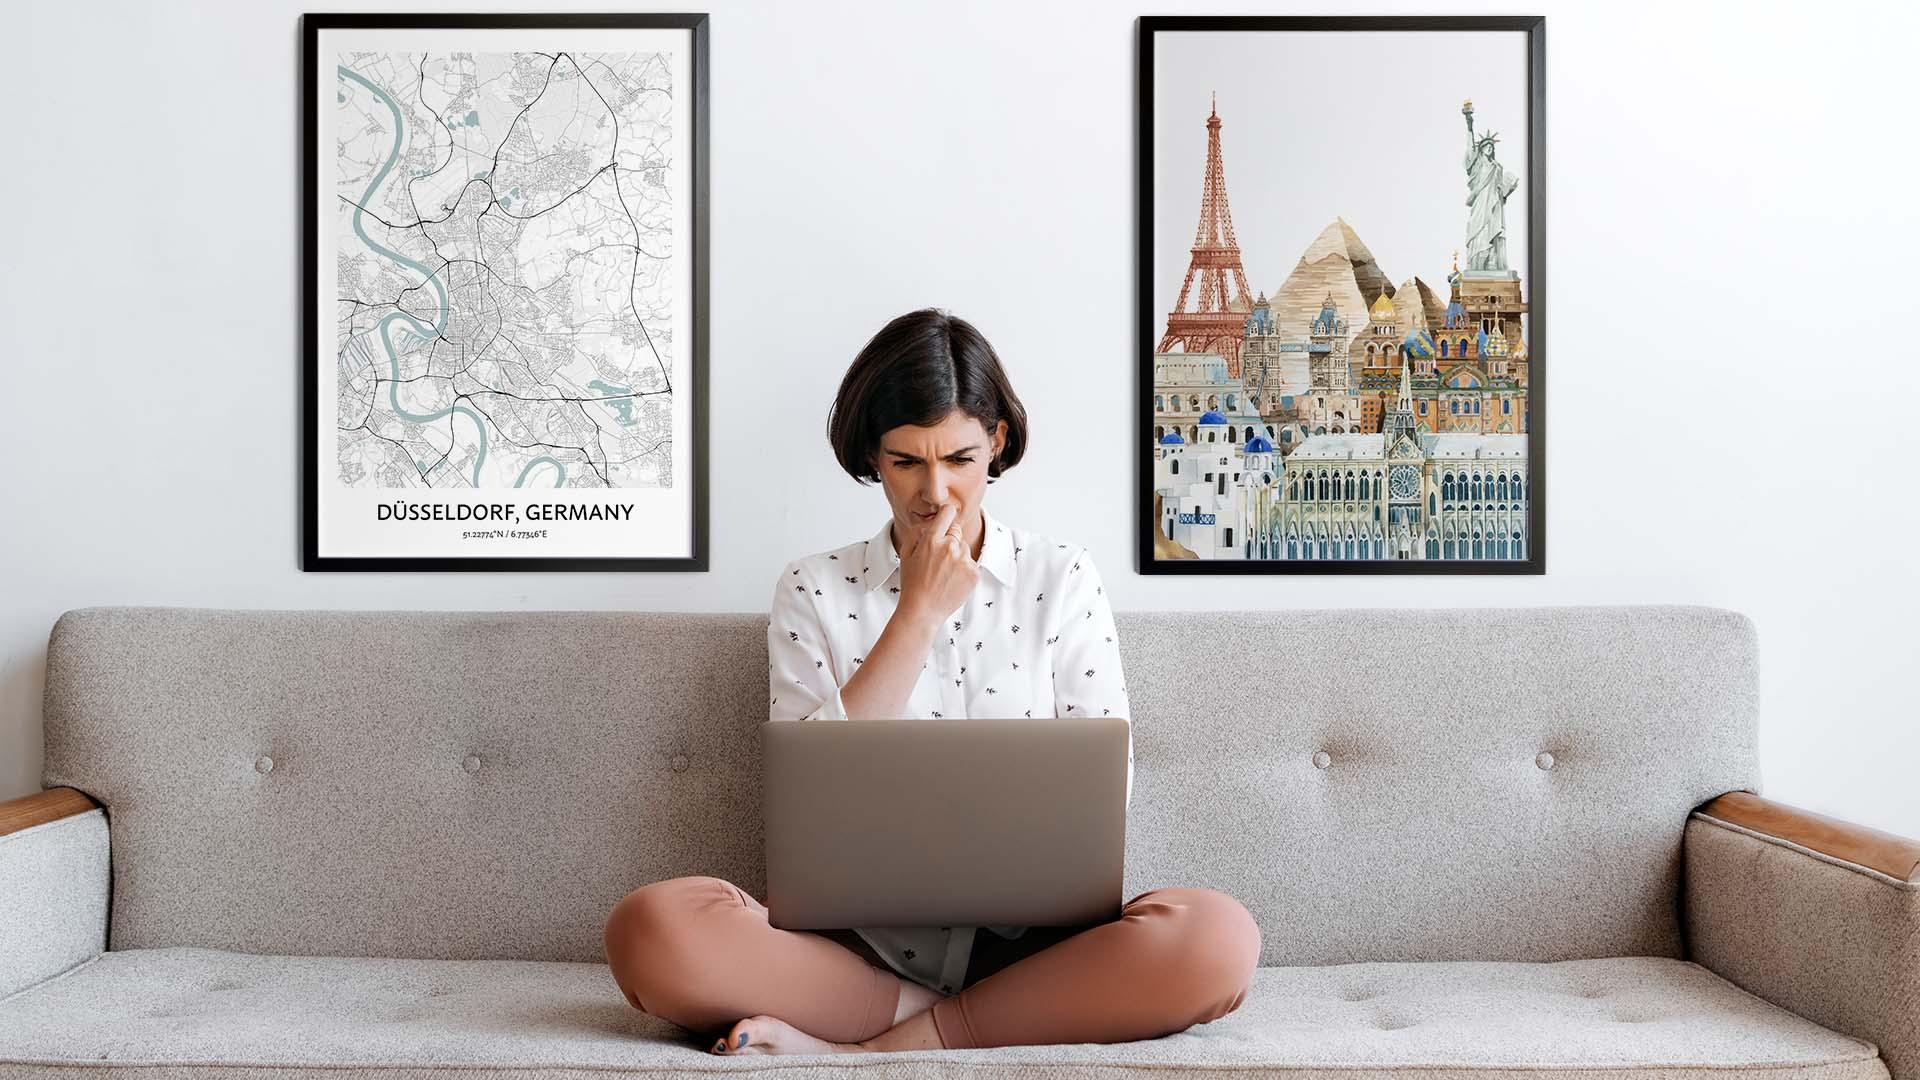 Dusseldorf city map art